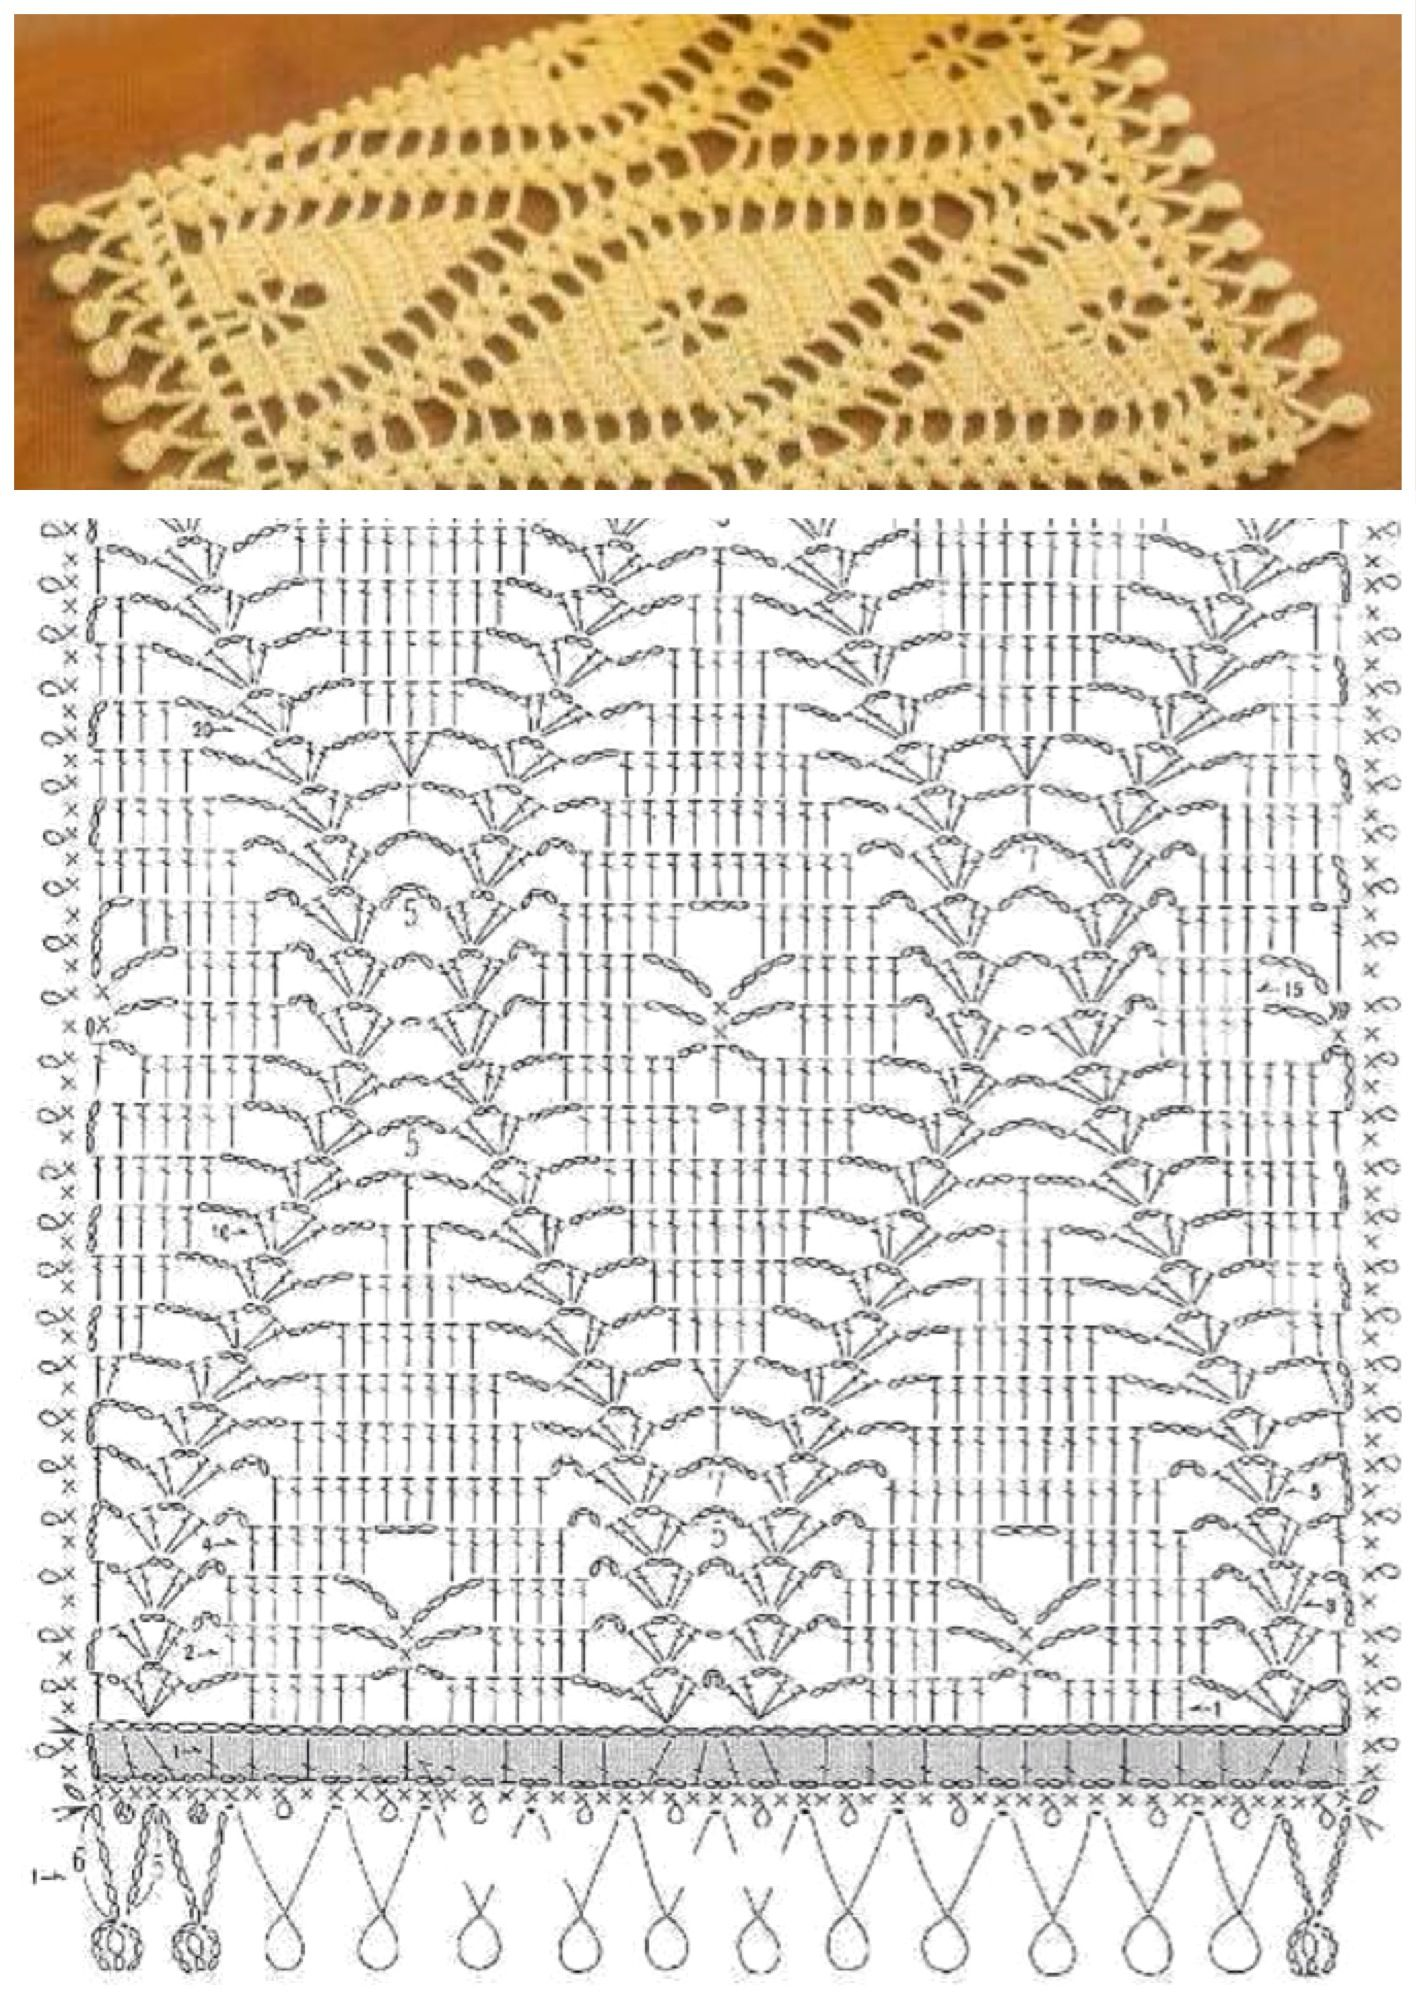 Crochet Stitches Diagrams Pinterest : Nice crochet stitch + diagram Puntadas de crochet Pinterest